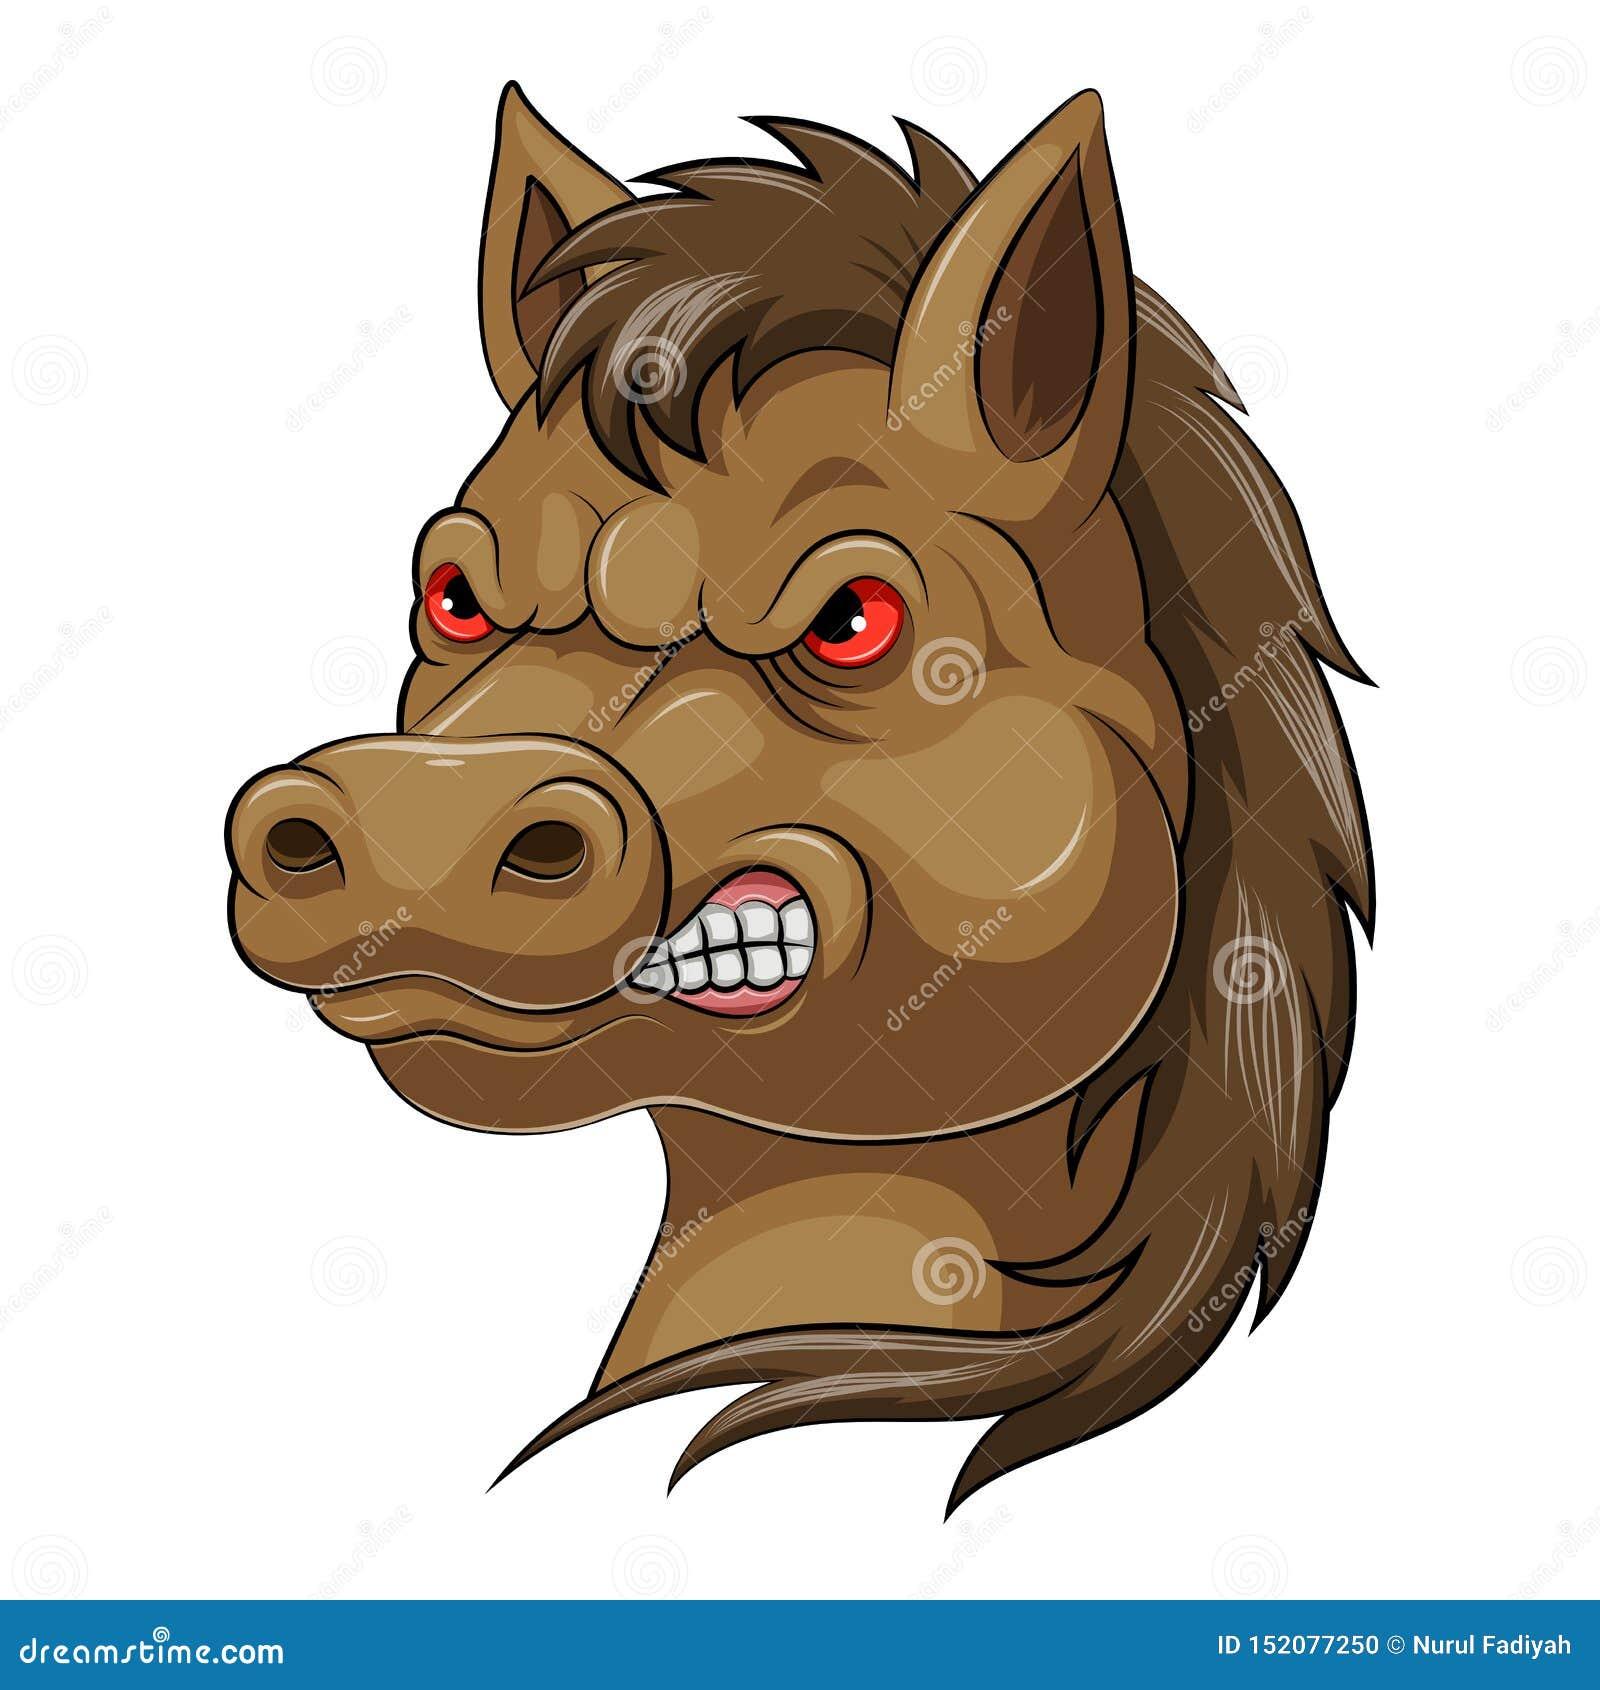 Mascot Head of an horse